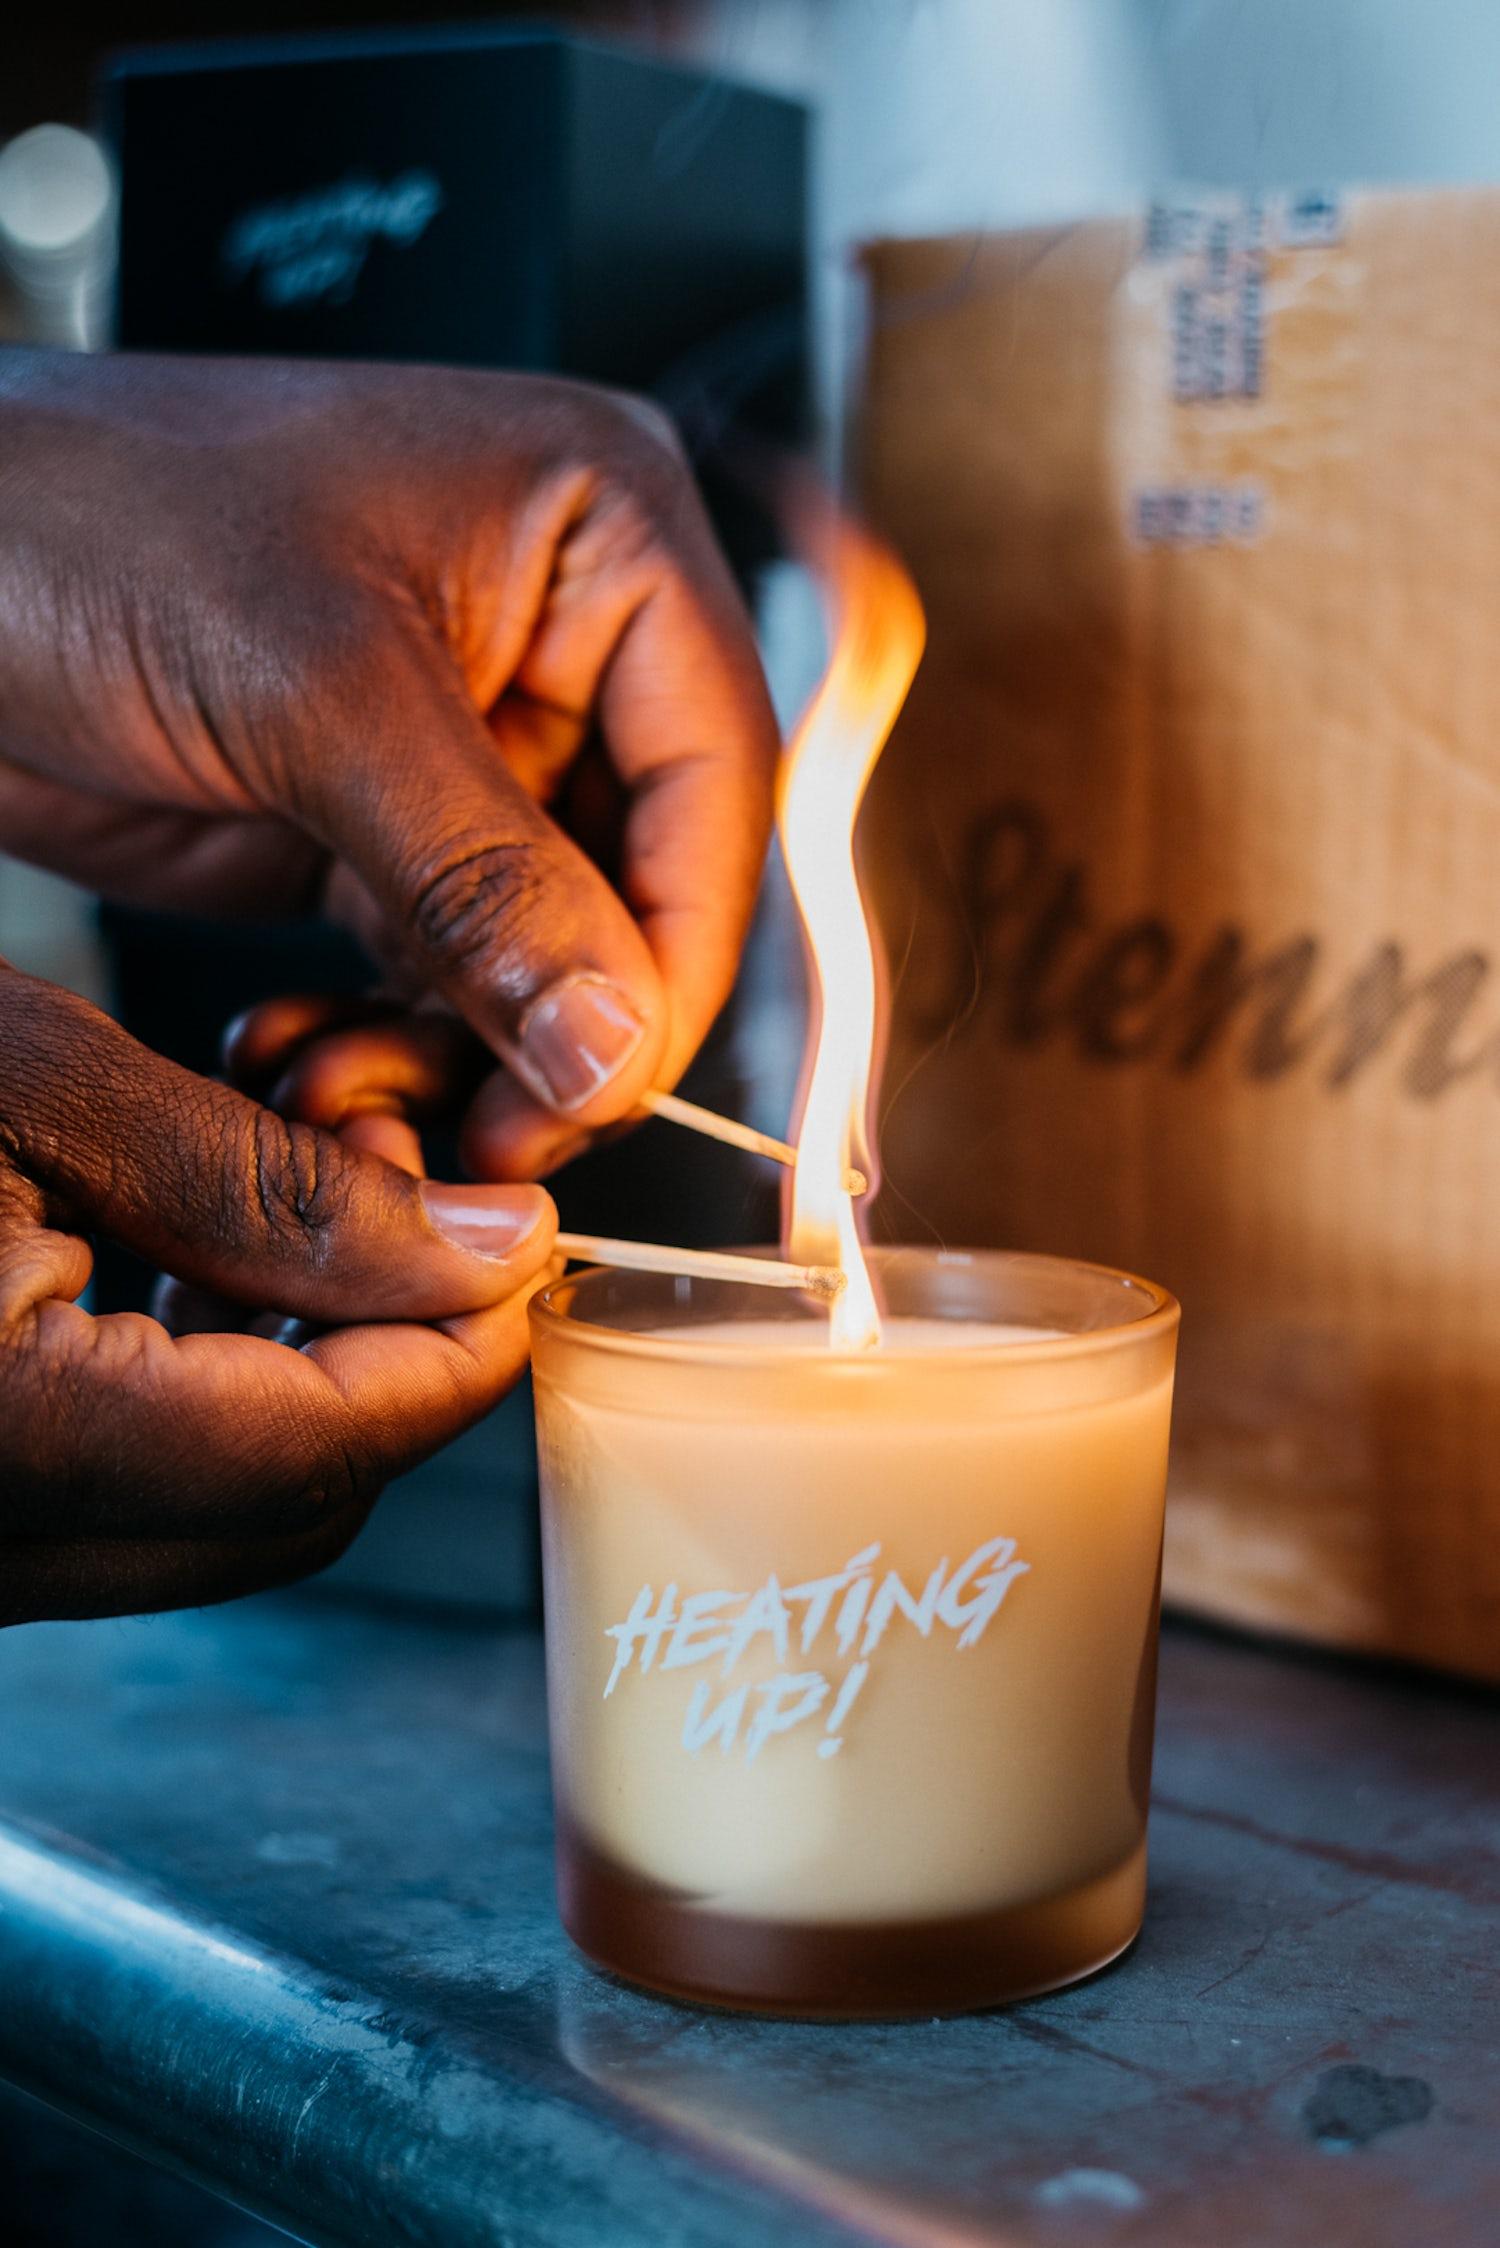 Modi Oyewole Heating Up 20